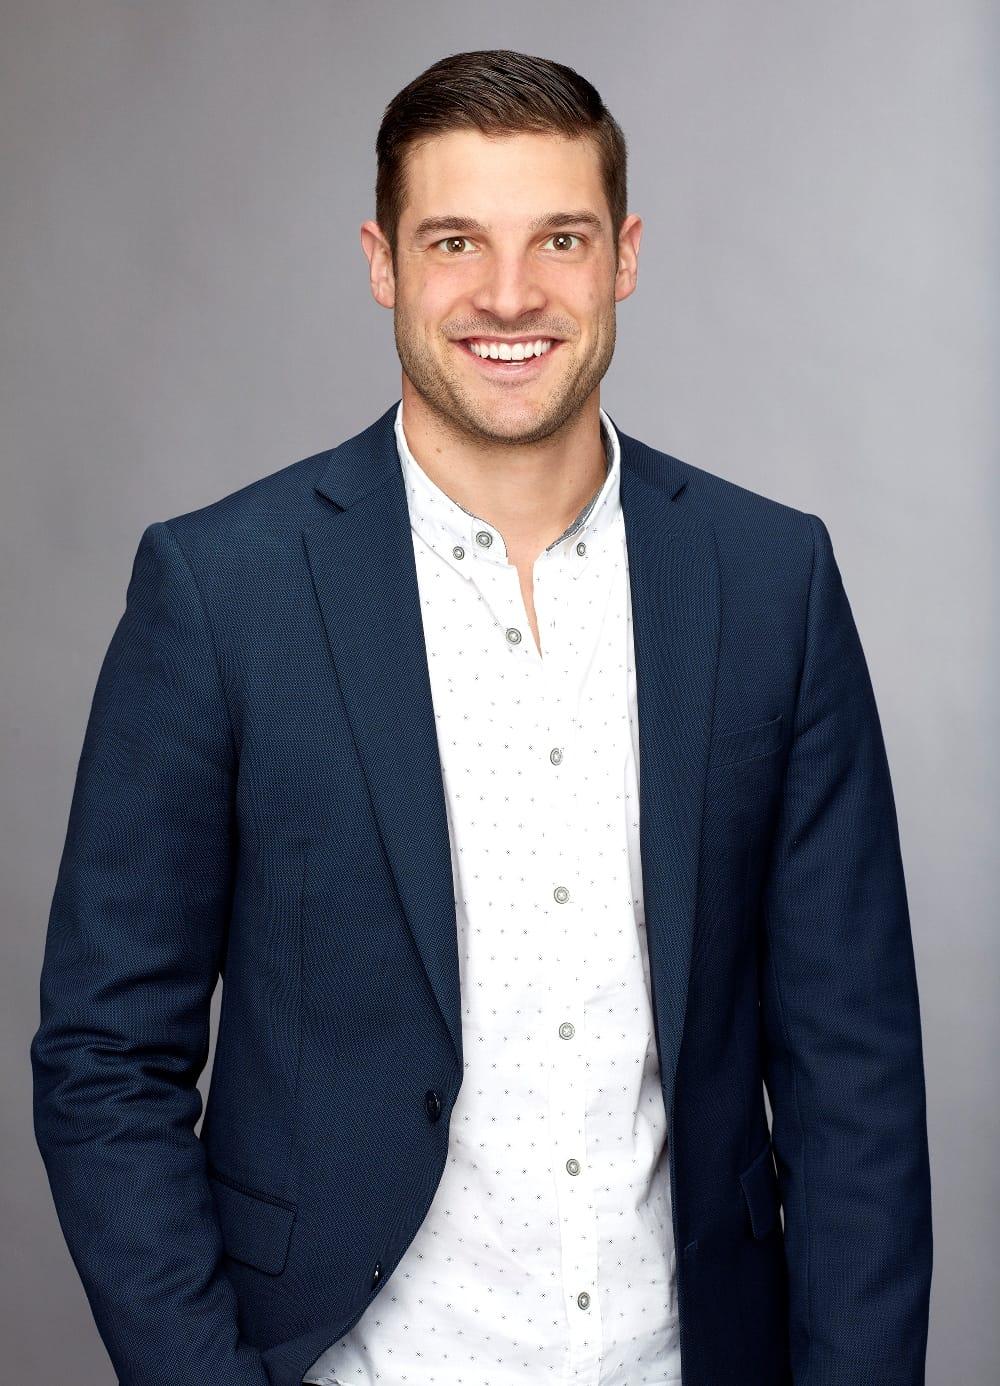 The Bachelorette Garrett Yrigoyen